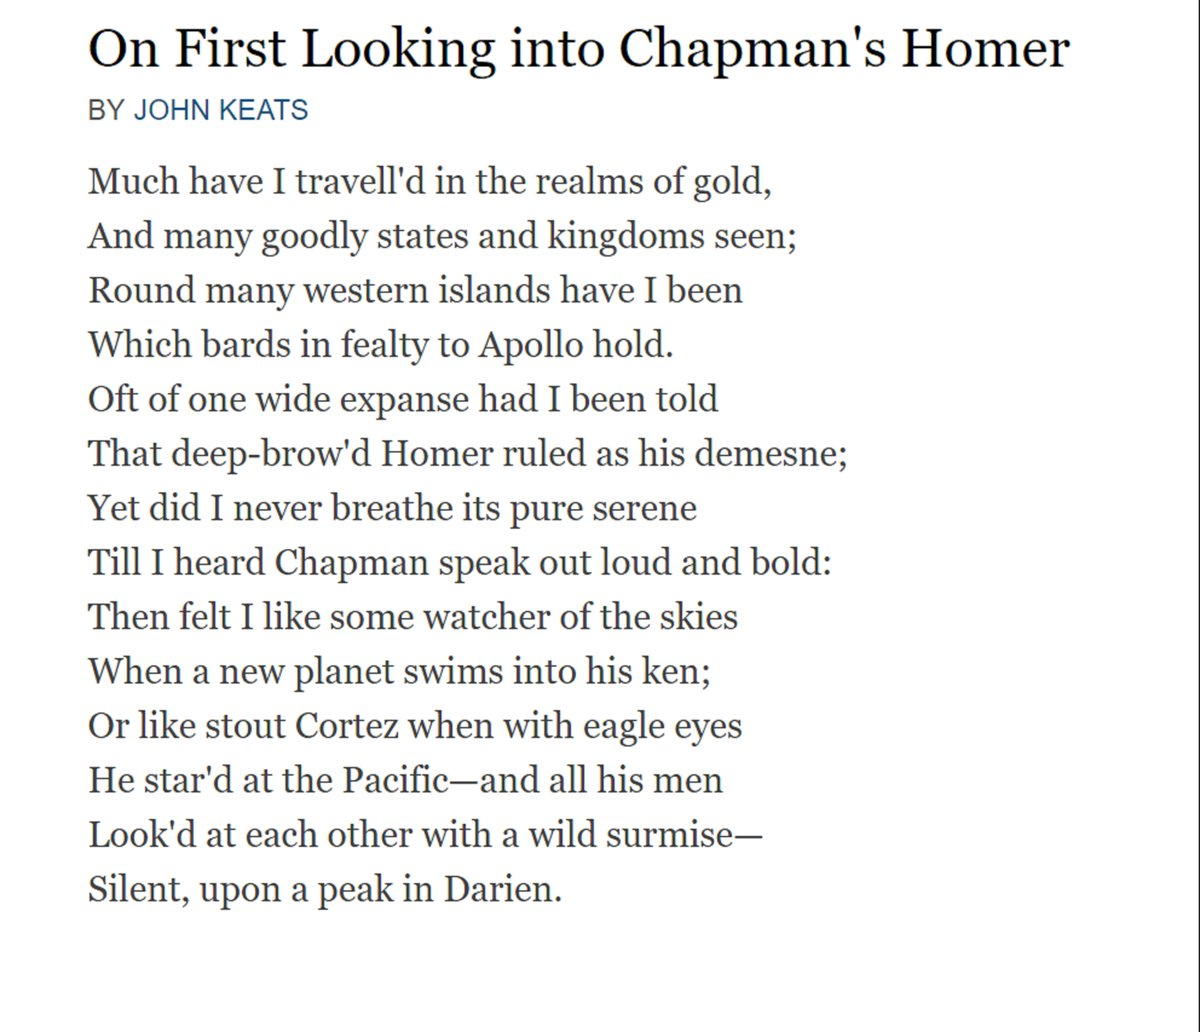 Into chapmans homer